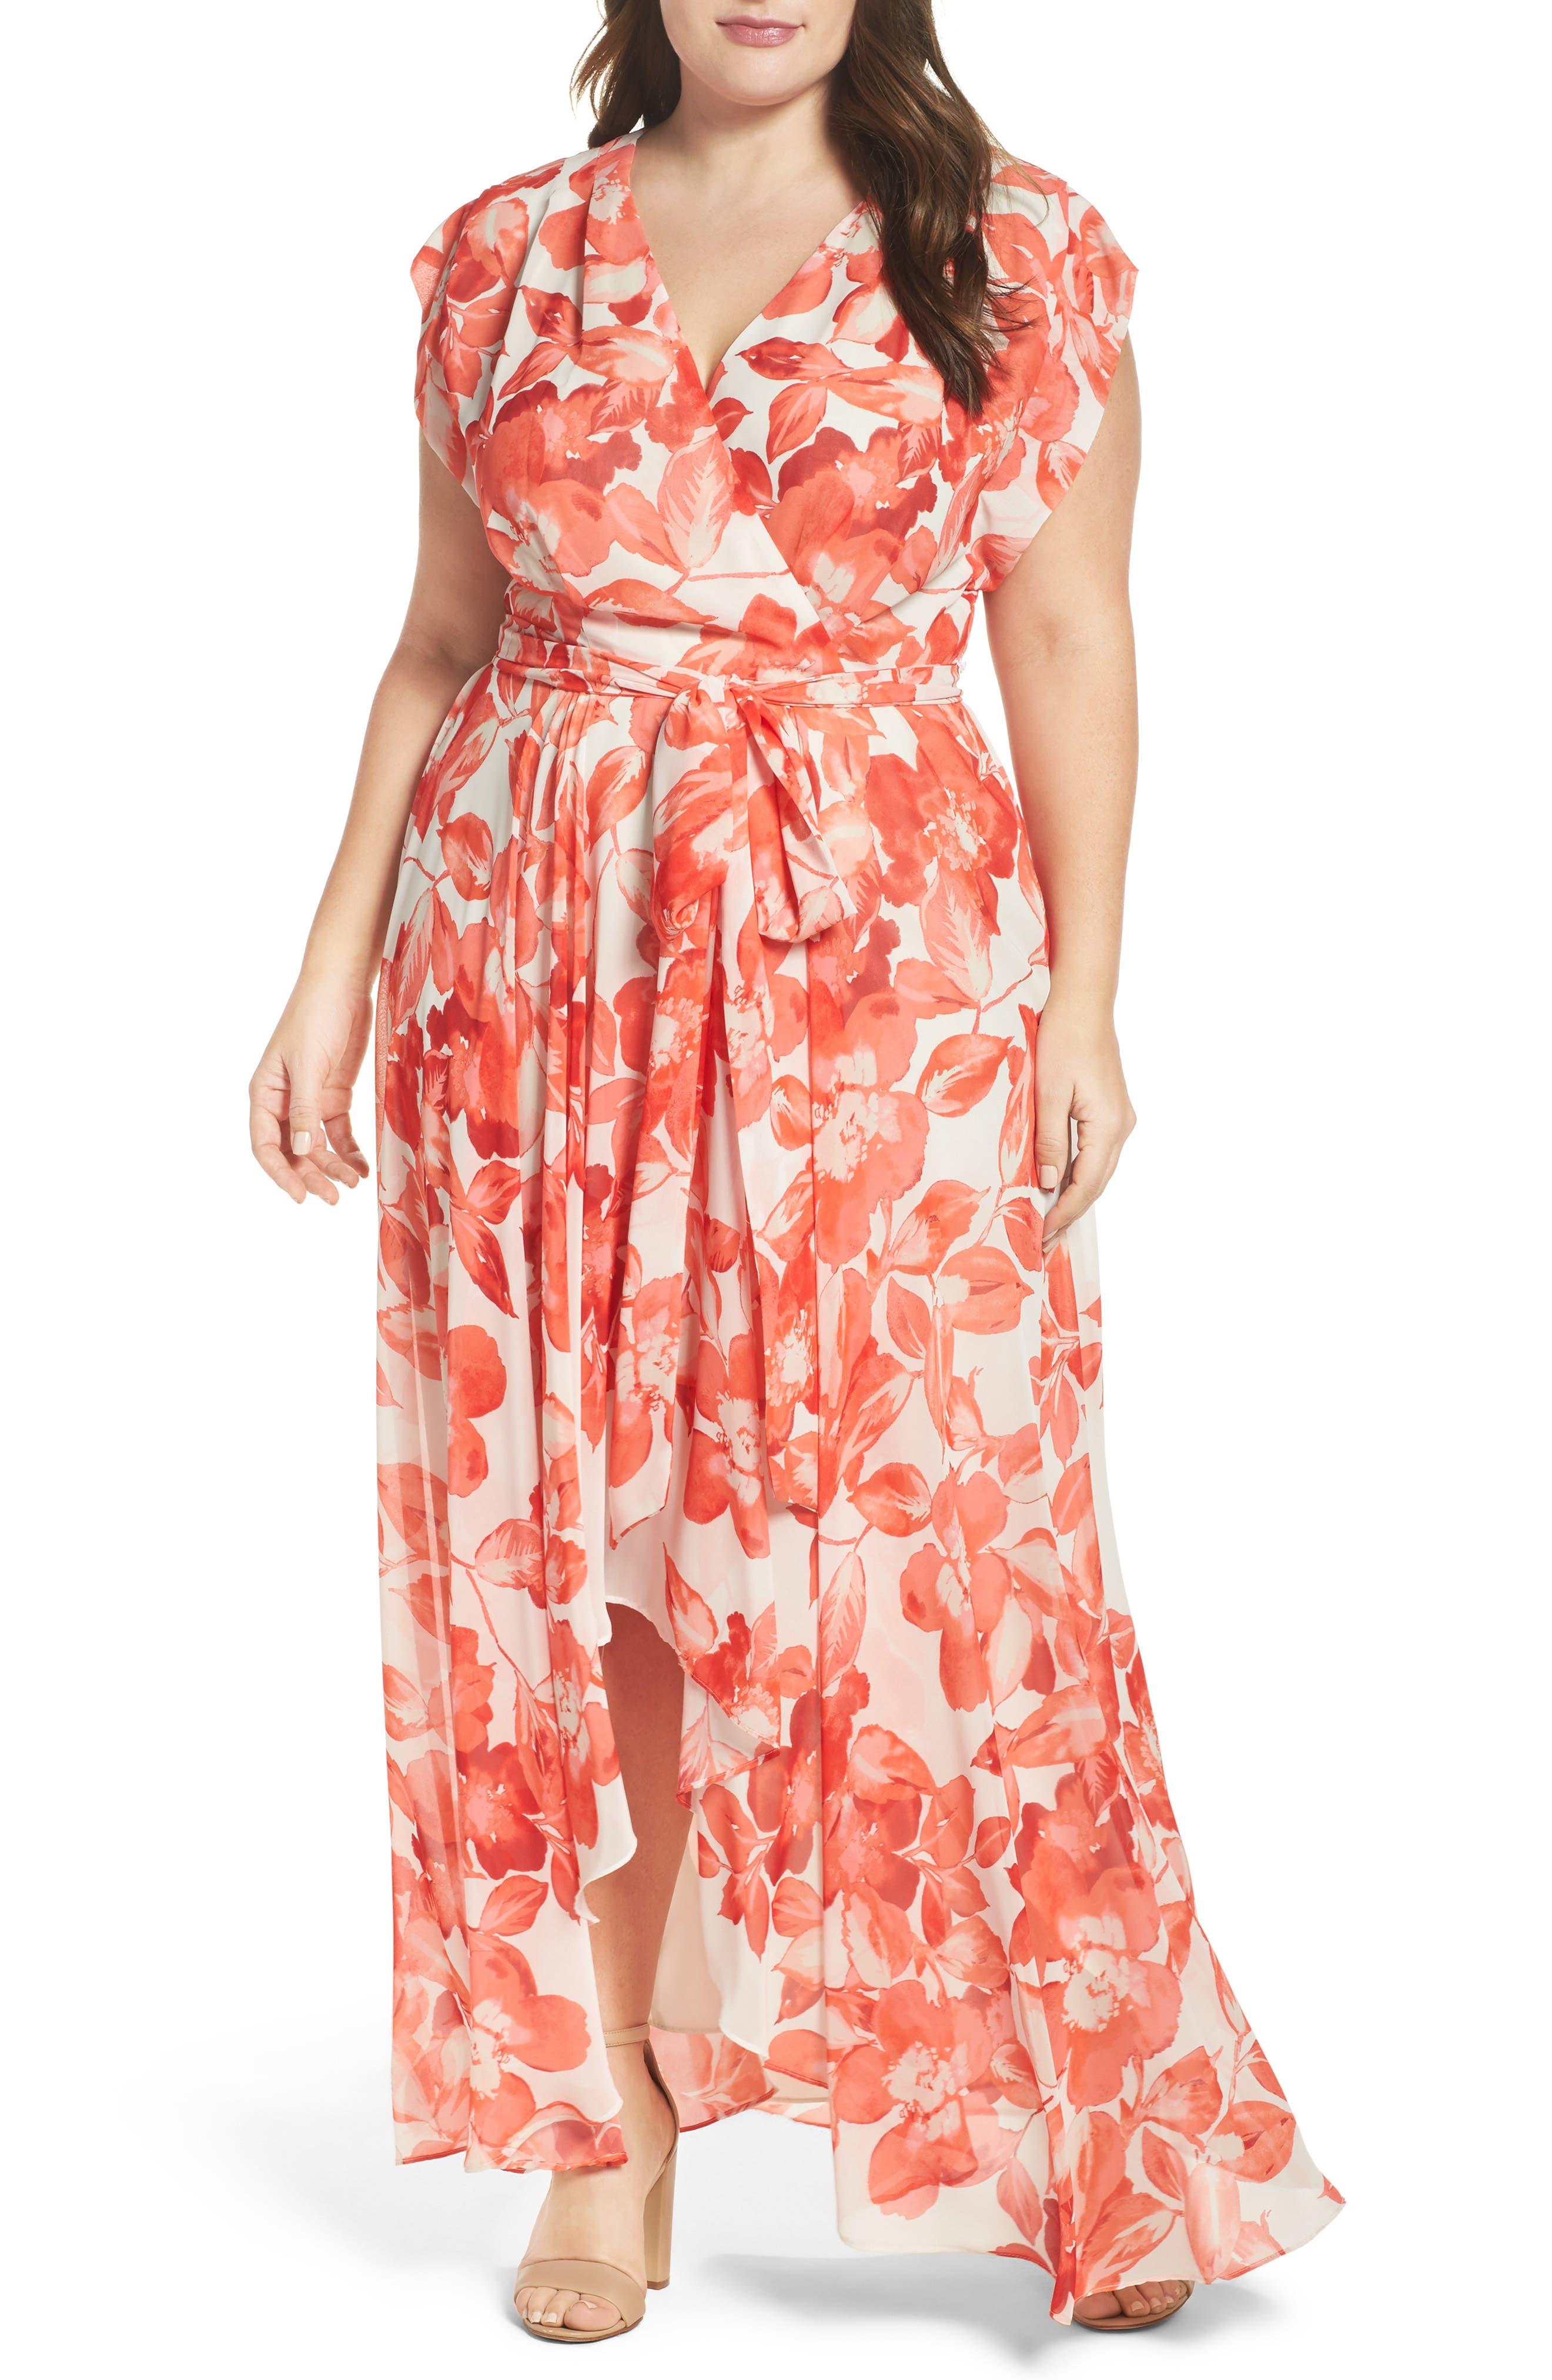 ELIZA J, Floral Chiffon High/Low Maxi Dress, Main thumbnail 1, color, 958